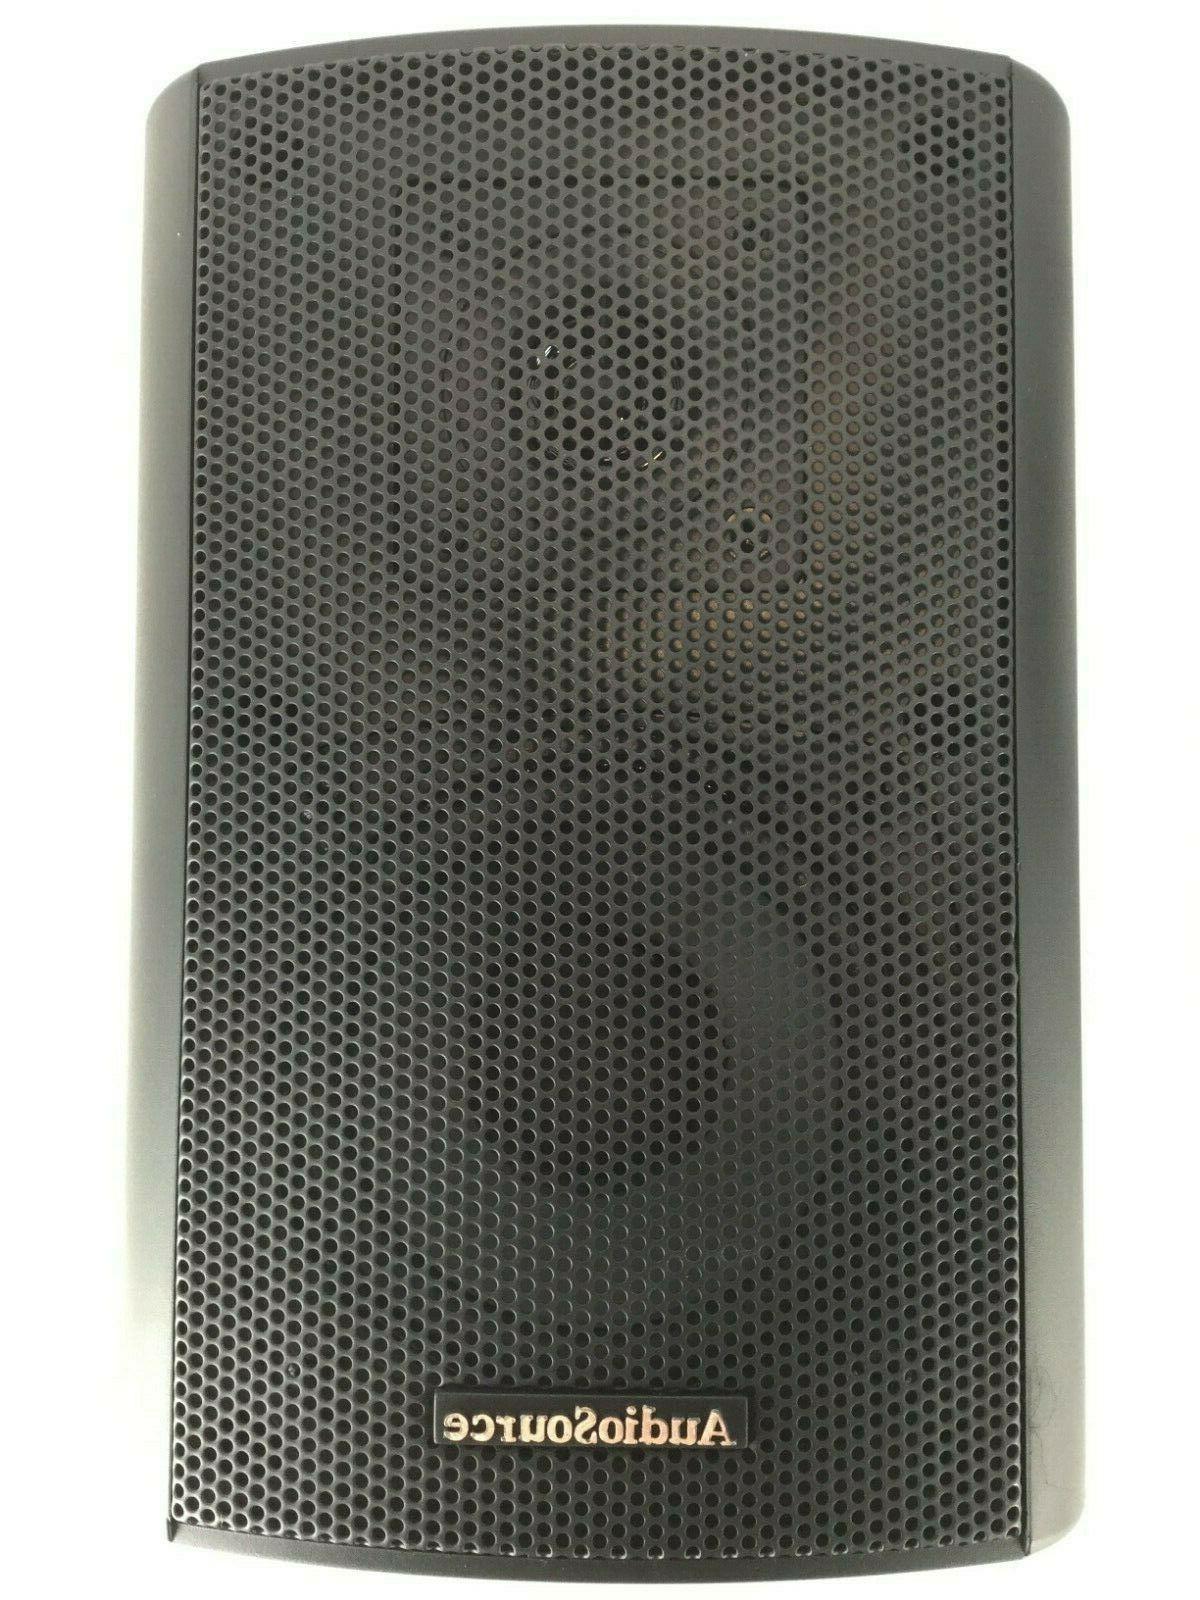 NEW! AudioSourse 2-Way Compact Surround Speakers